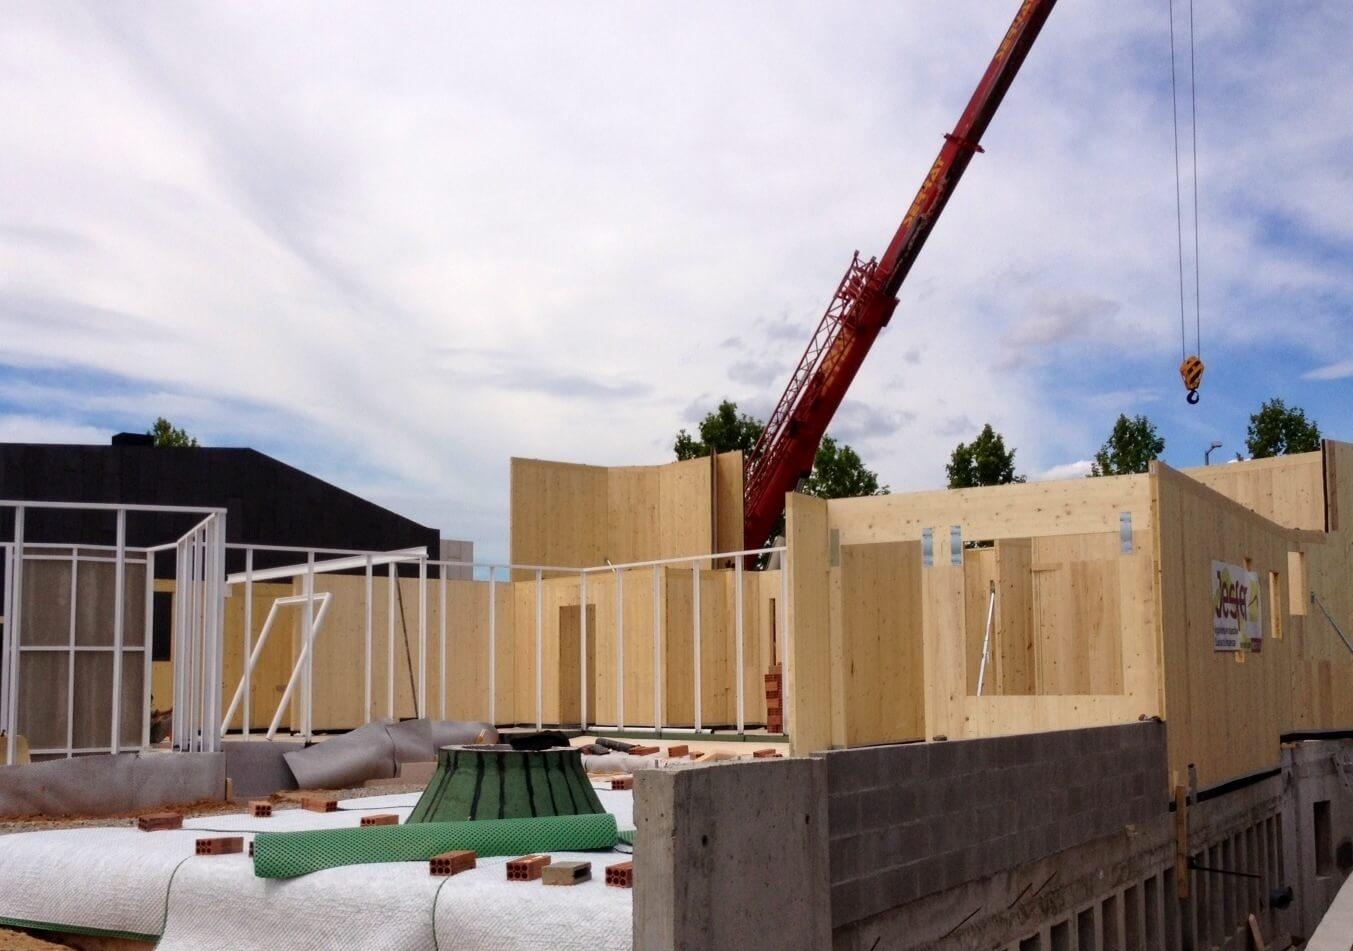 vivienda de madera montaje